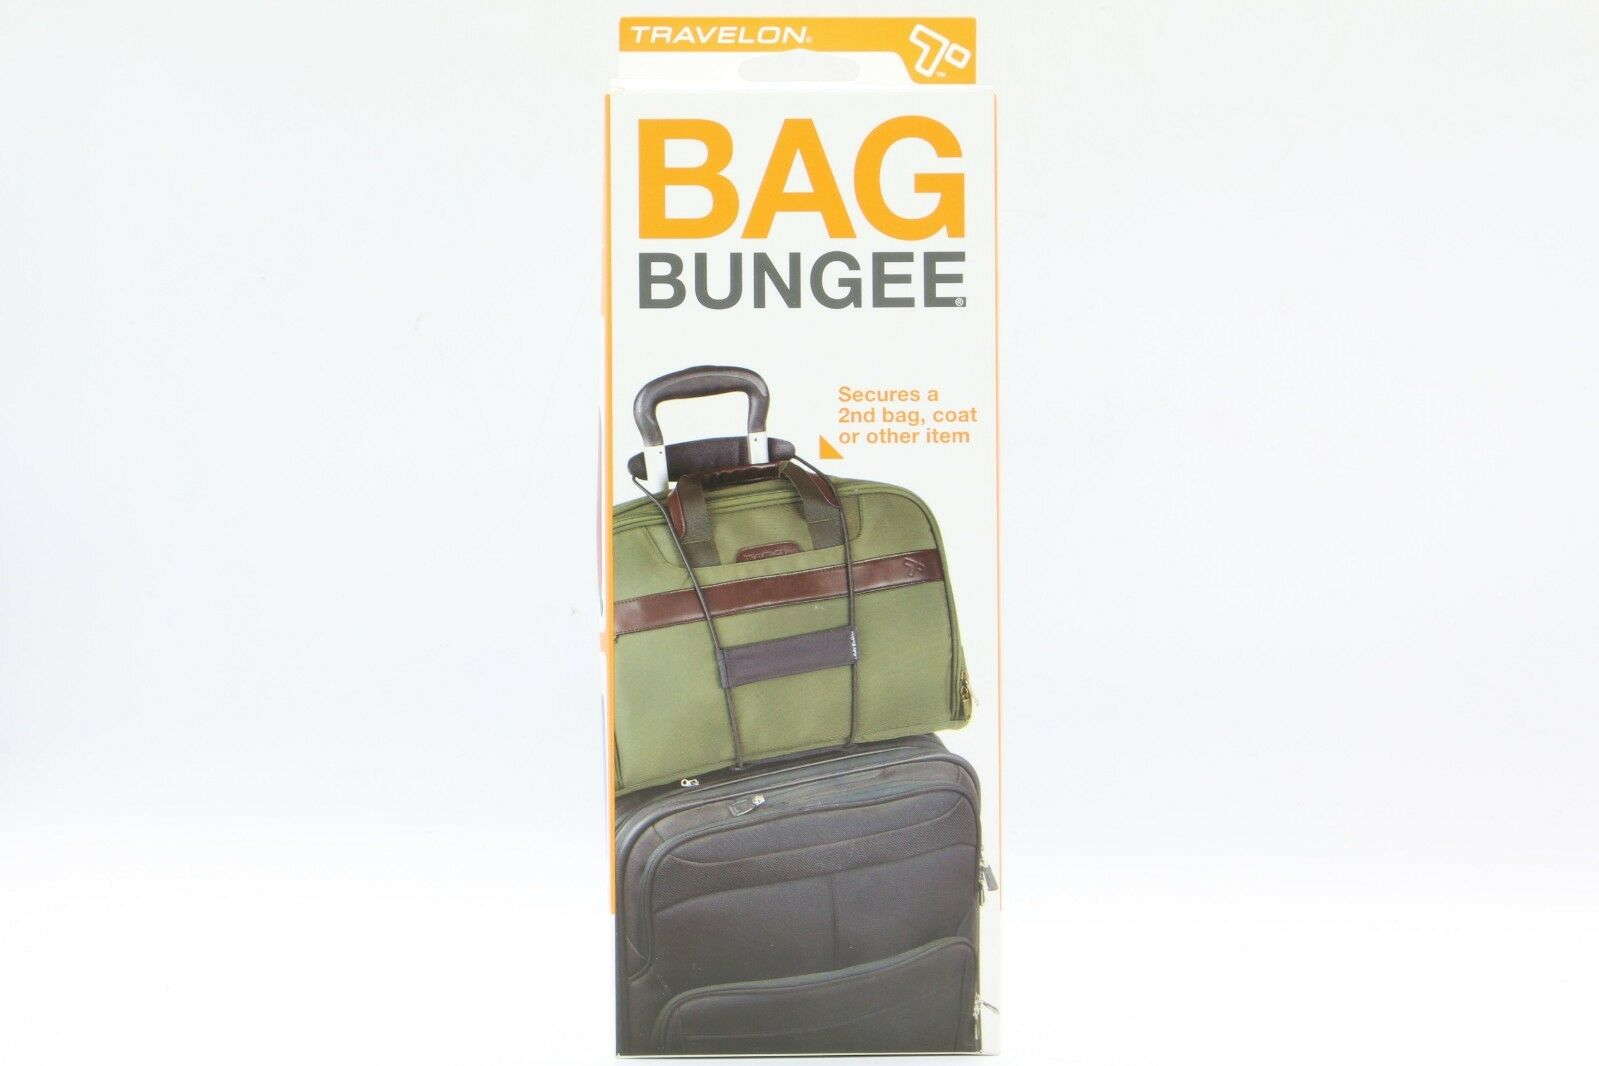 2ae4c0011603 Travelon Bag Bungee Luggage Strap Black Jl6 Z49-22